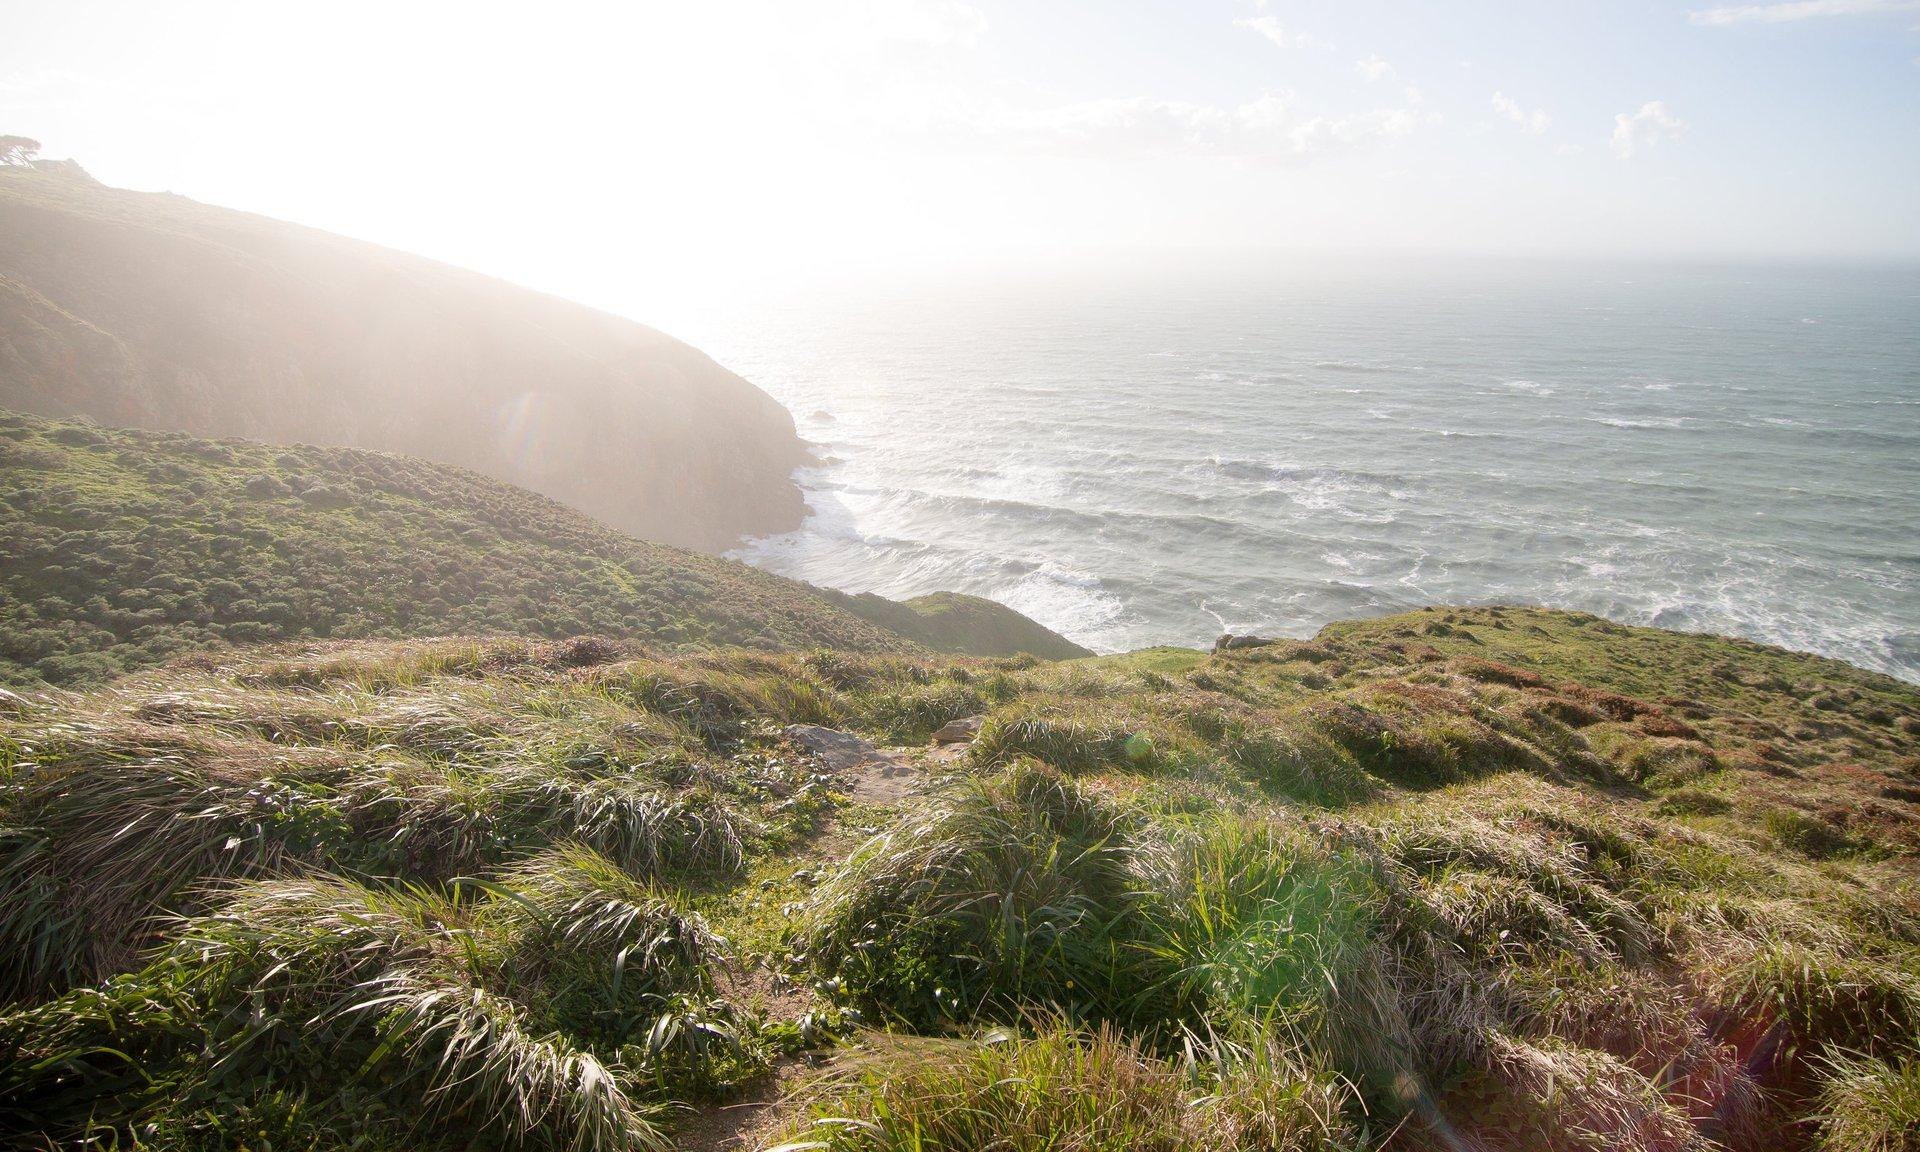 Point Reyes National Seashore, Marin County, California 2020